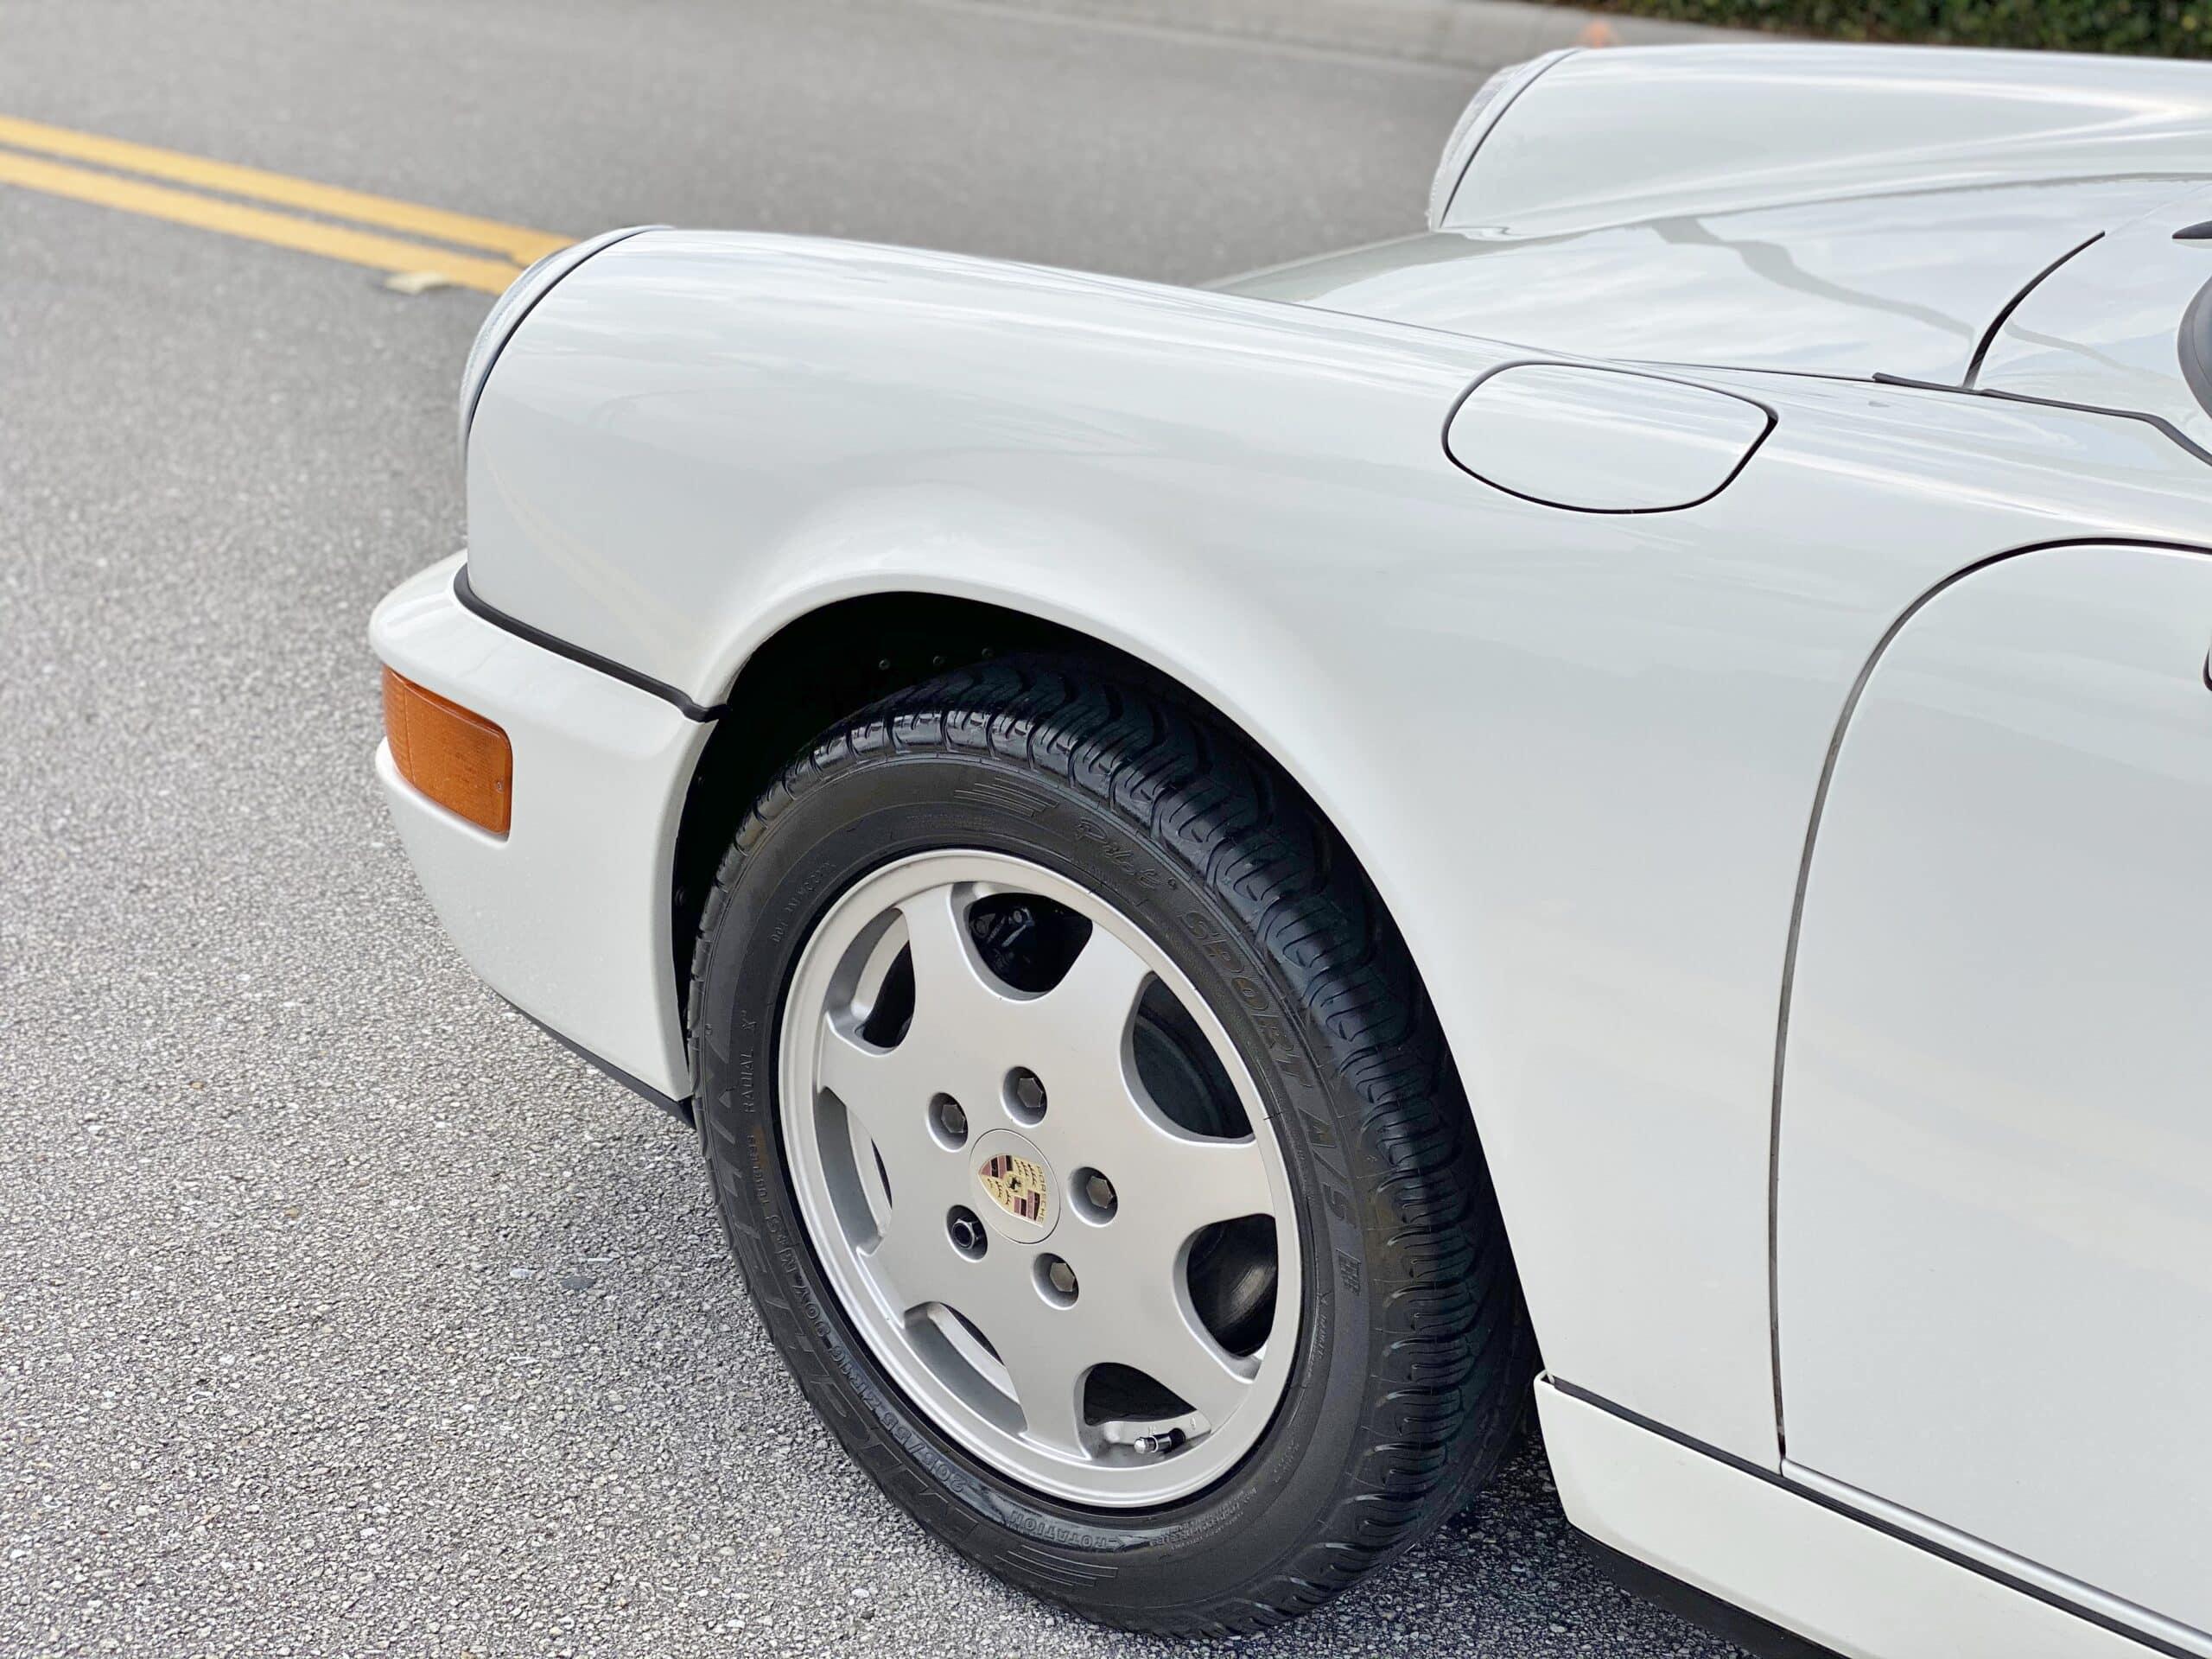 1990 Porsche 911 964 Carrera 2 GP White C2 / G50 5 Speed Manual / Texas Native / Service records /Clean history